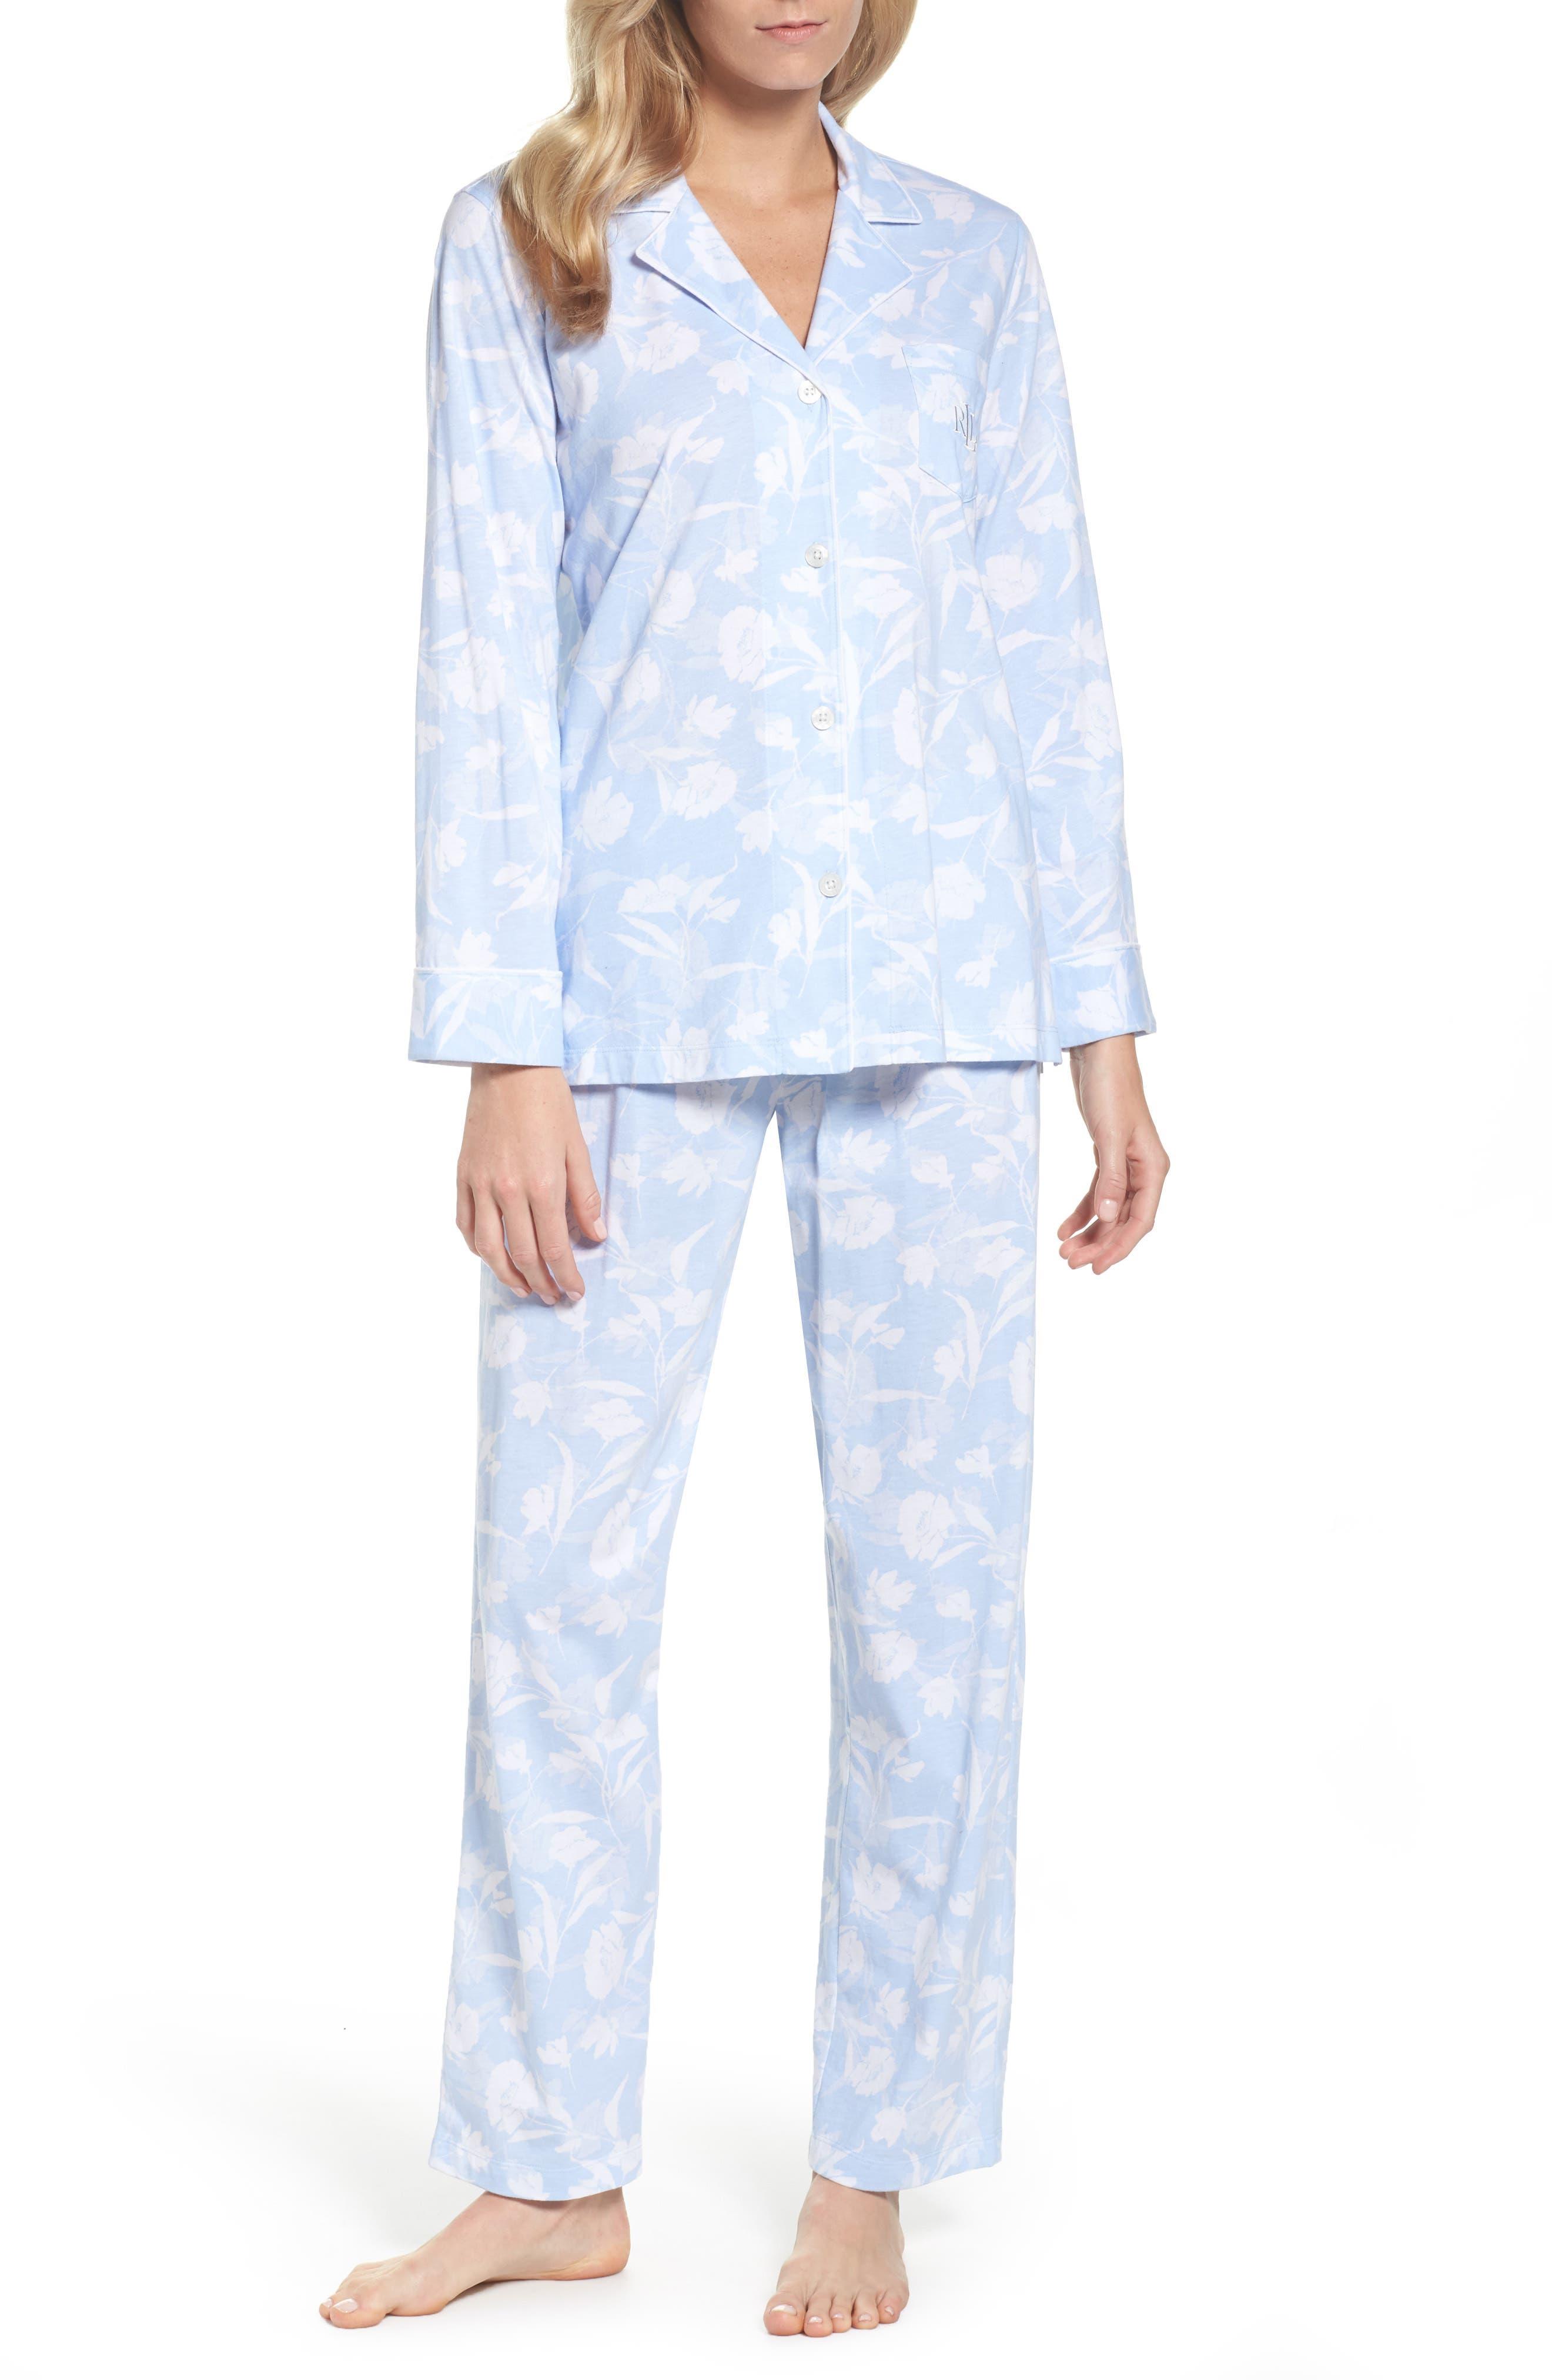 Floral Print Jersey Pajamas,                             Main thumbnail 1, color,                             Blue Monotone Floral